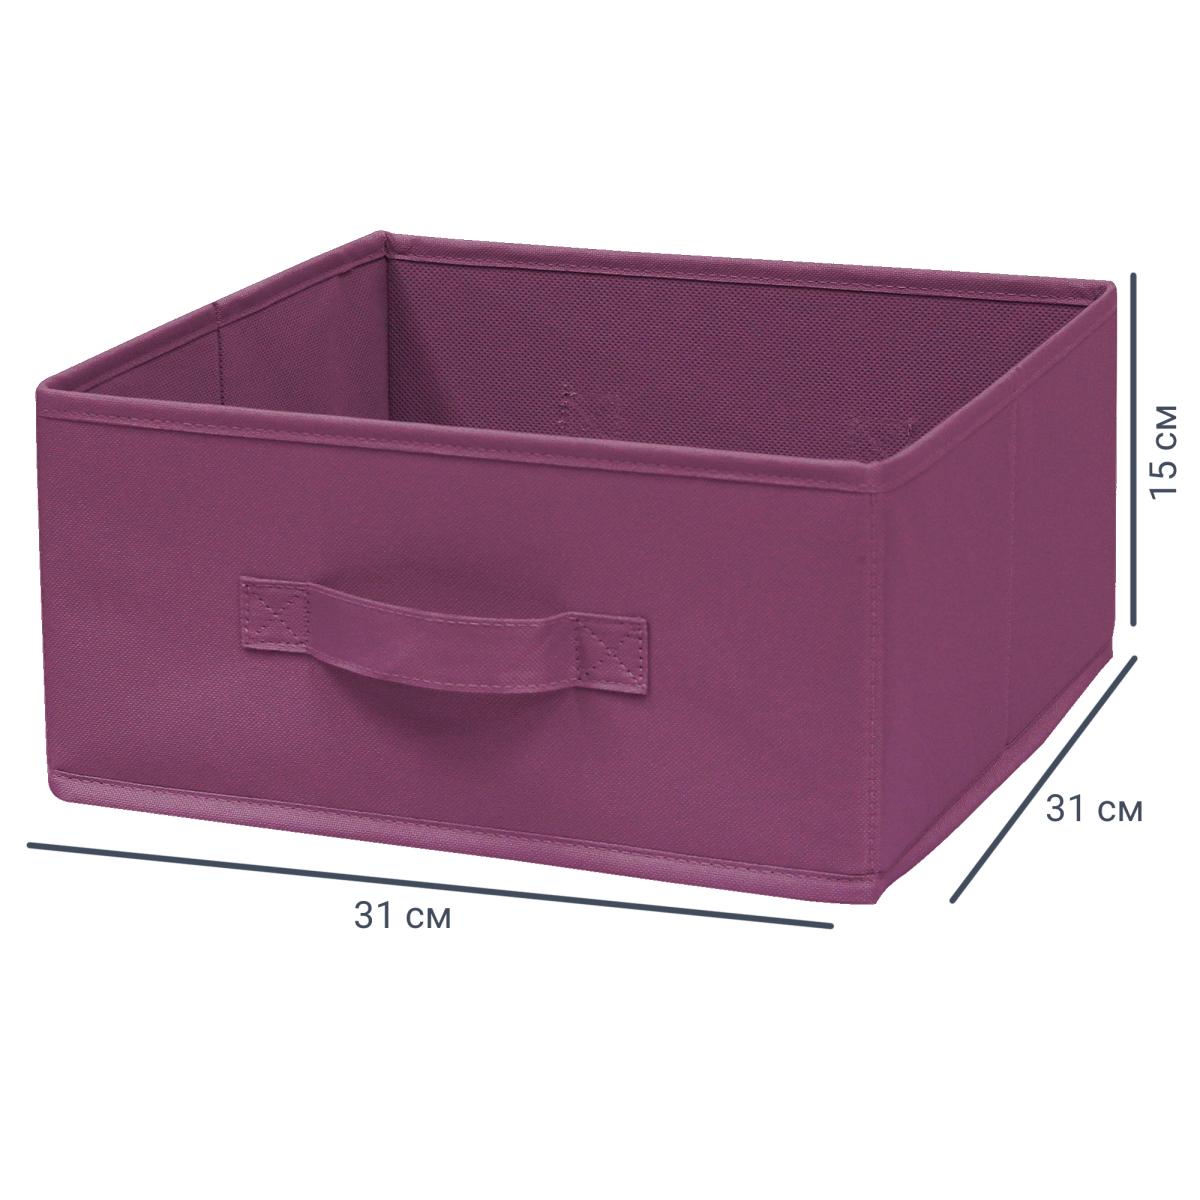 Короб Spaceo Berry 15х31х31 см 14.4 л полиэстер цвет черничный